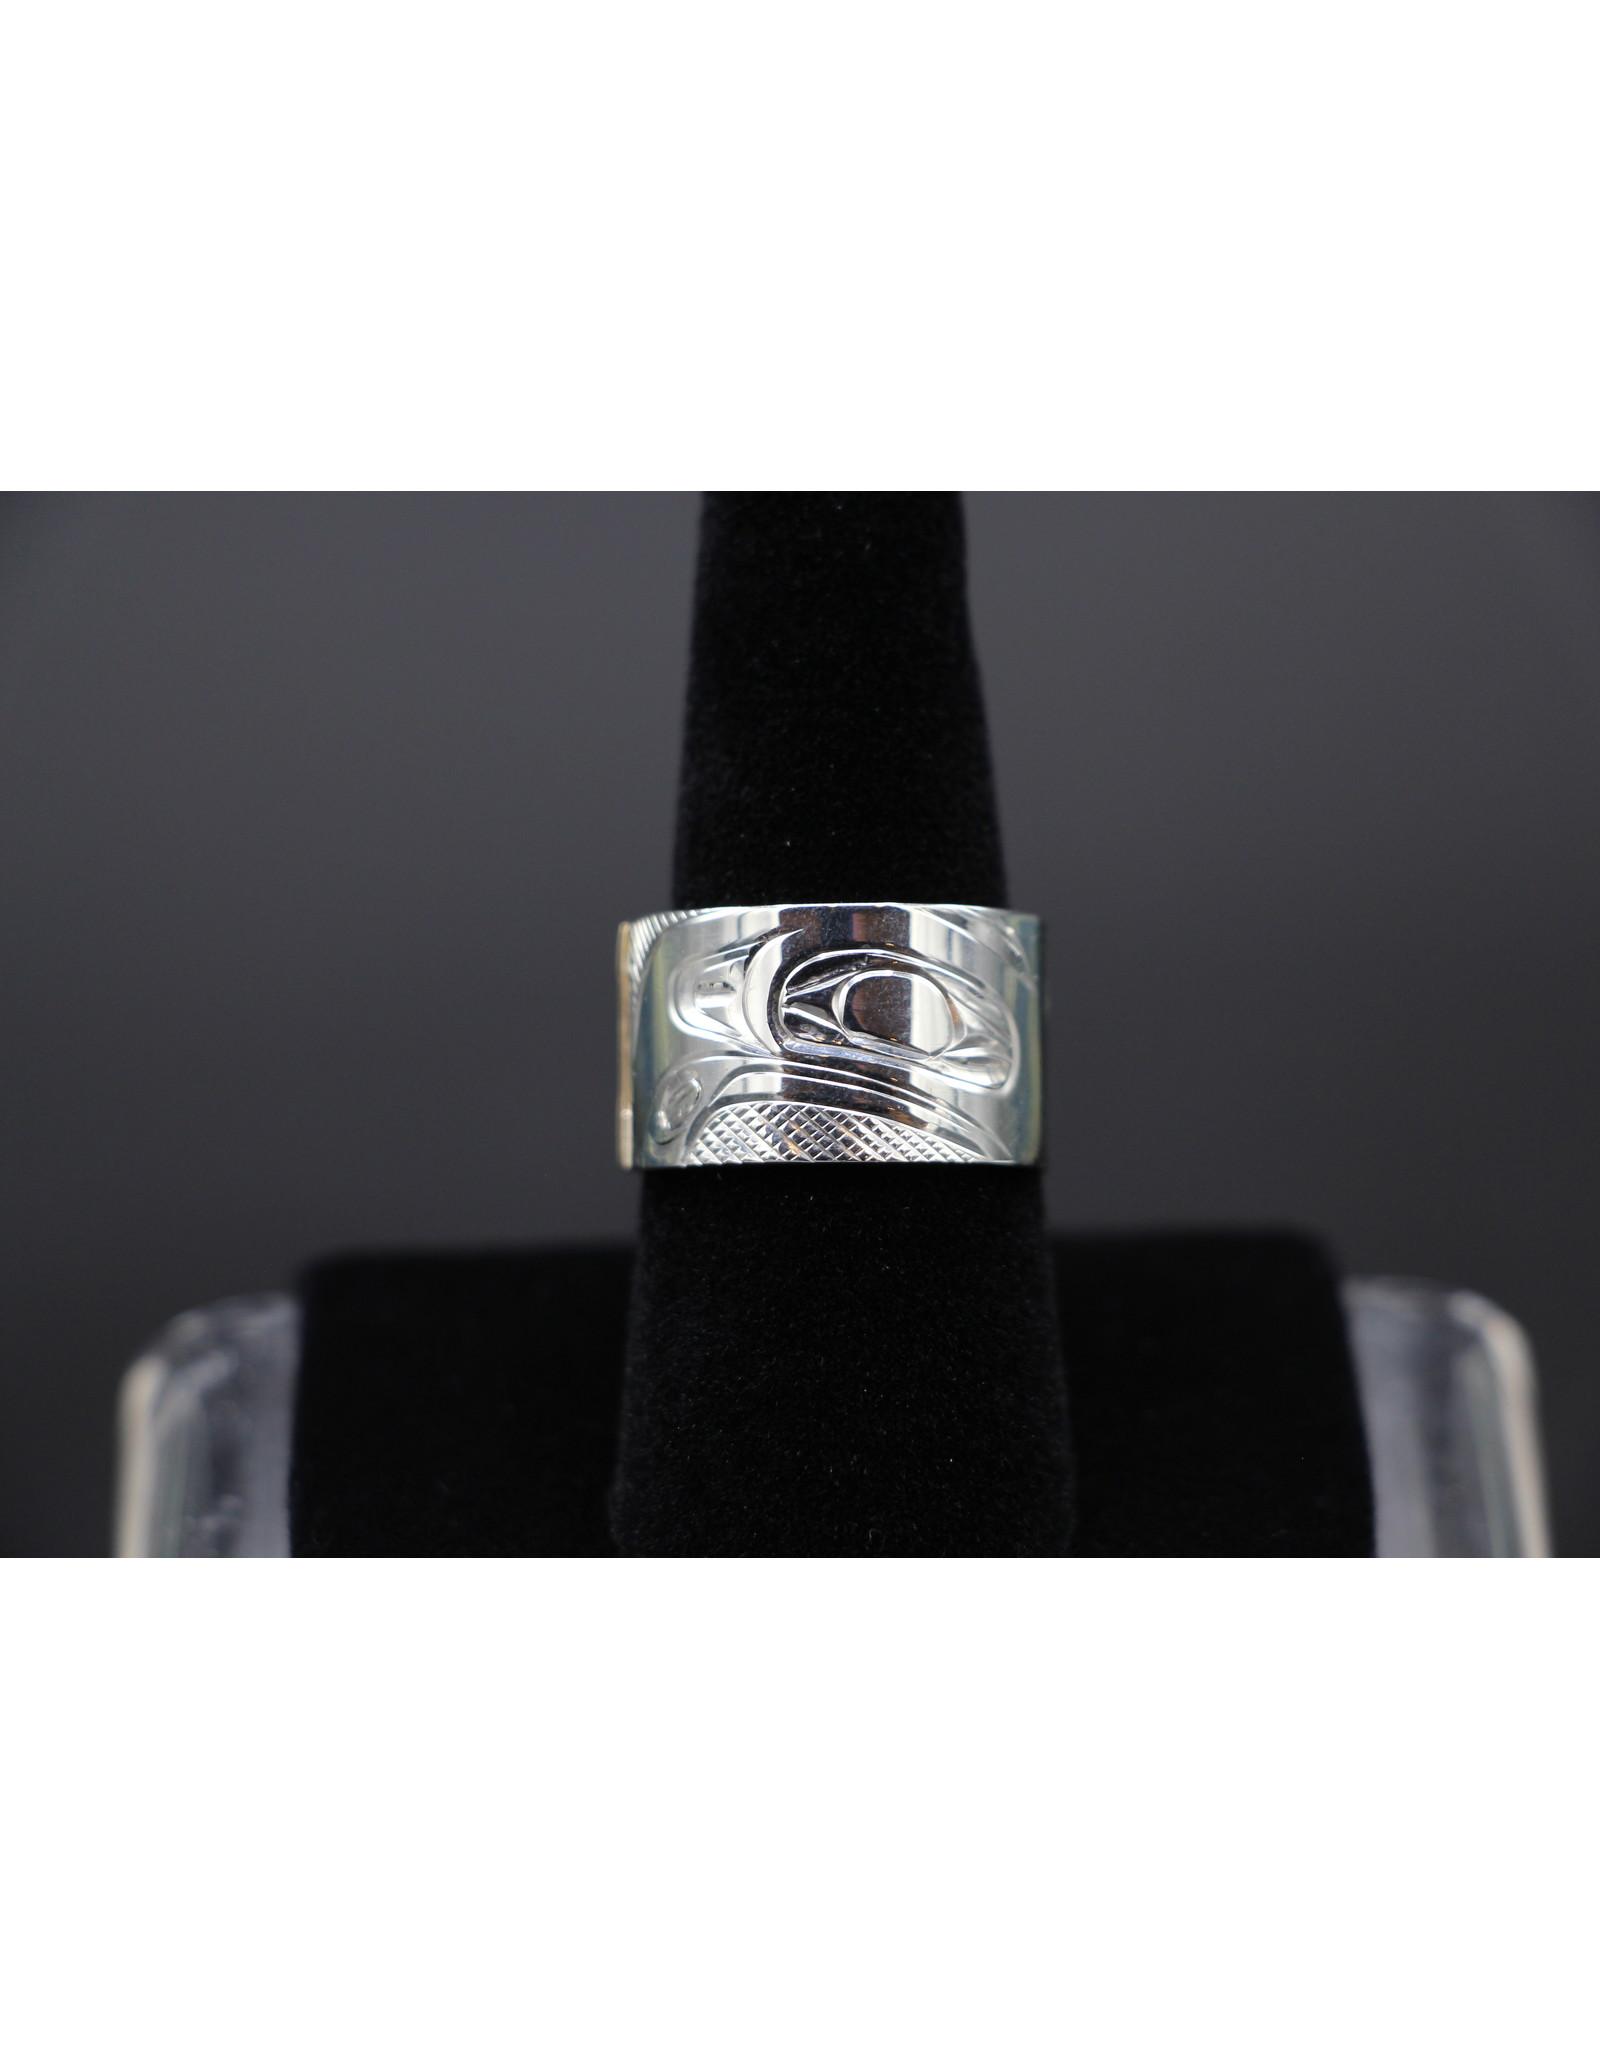 Eagle & Raven Ring by Corrine Hunt - CHR1